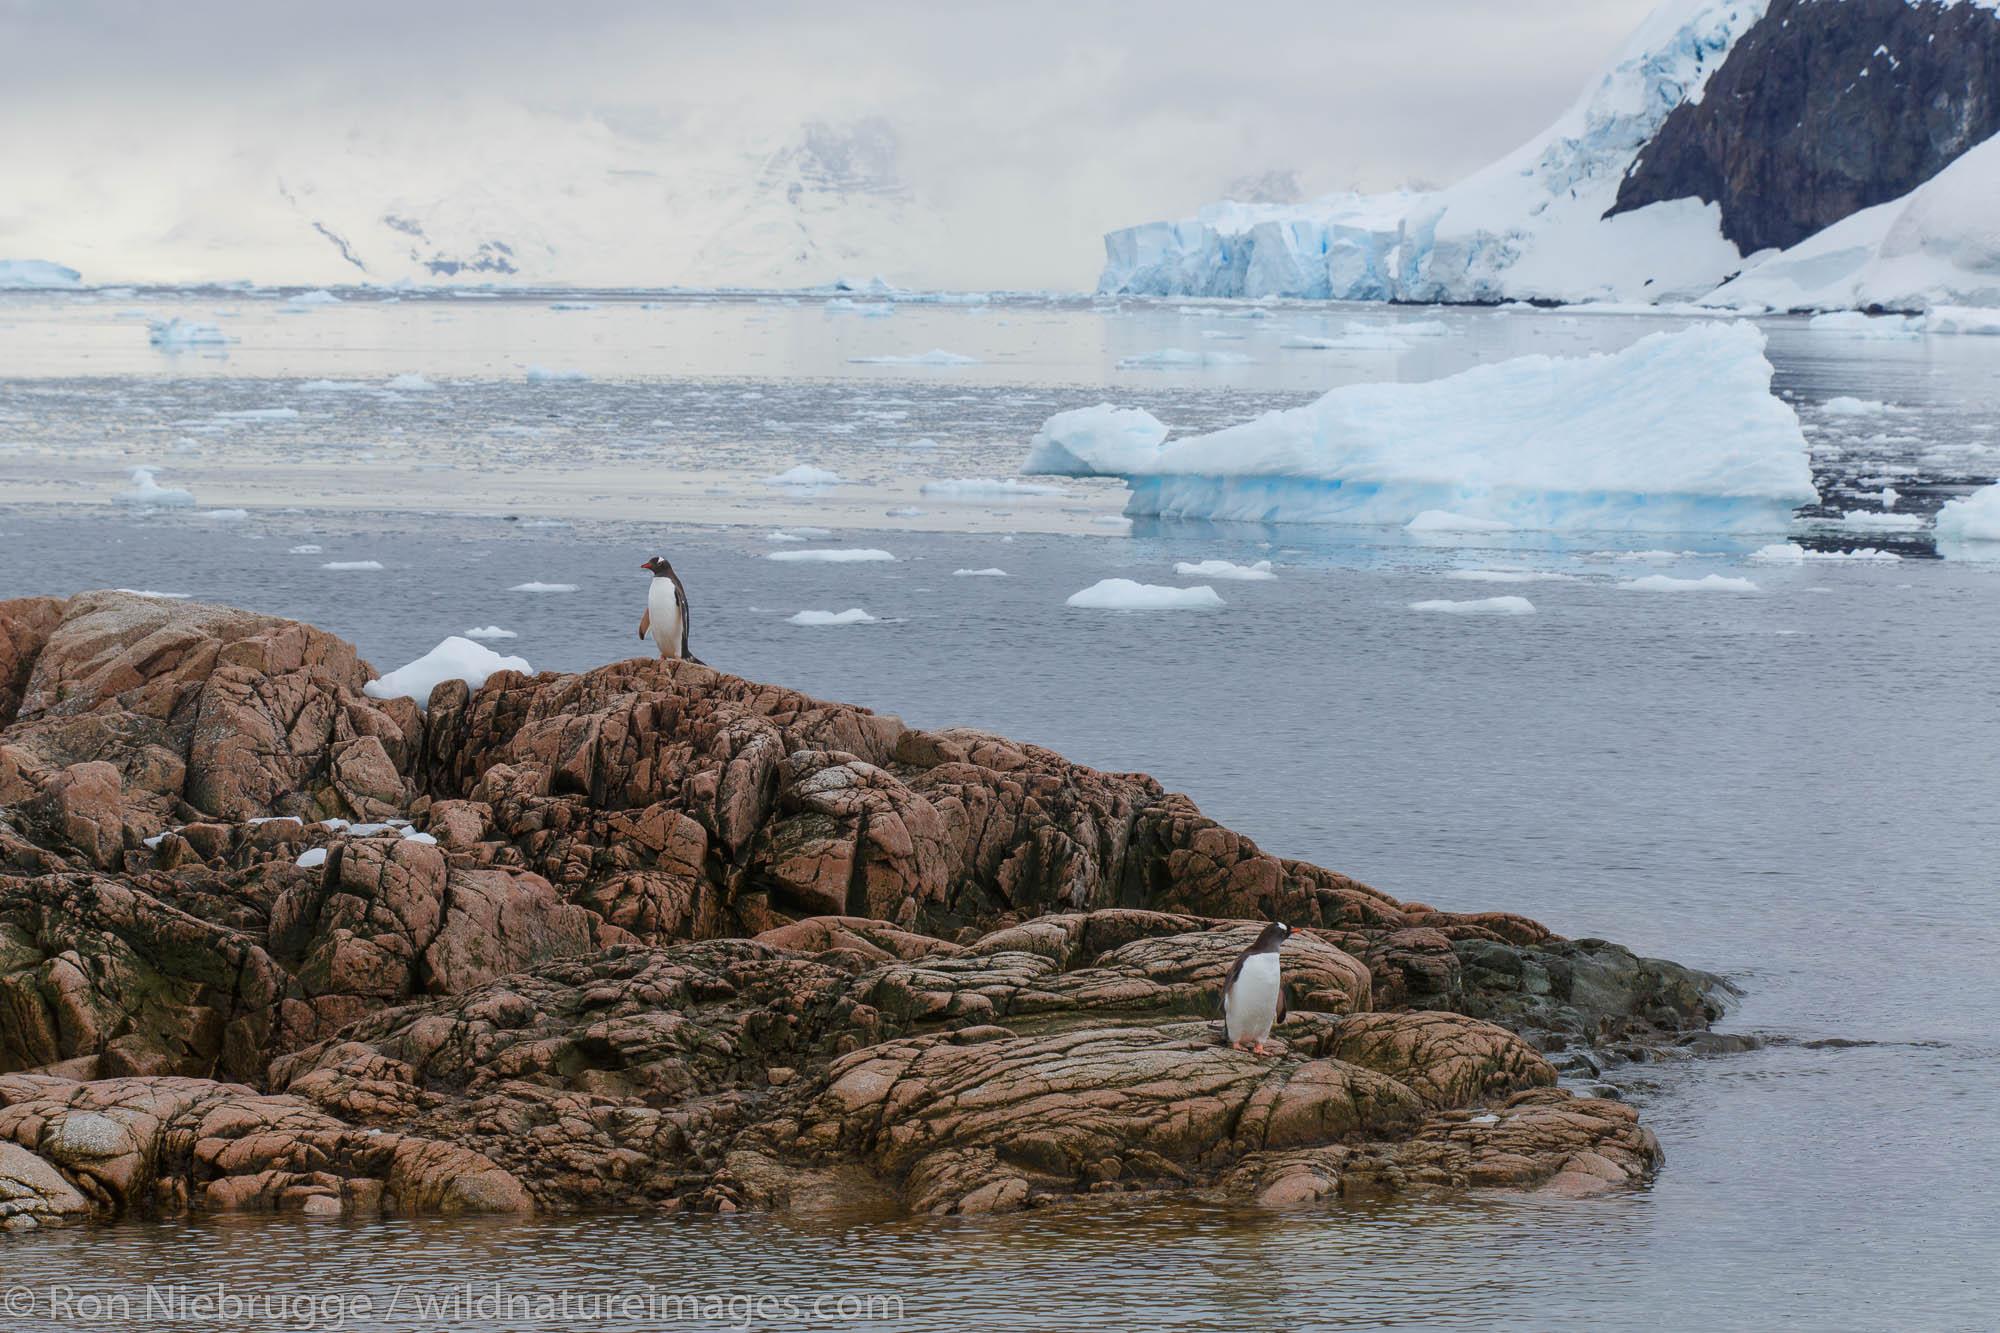 Gentoo penguin (Pygoscelis papua), Neko Harbour, Antarctica.